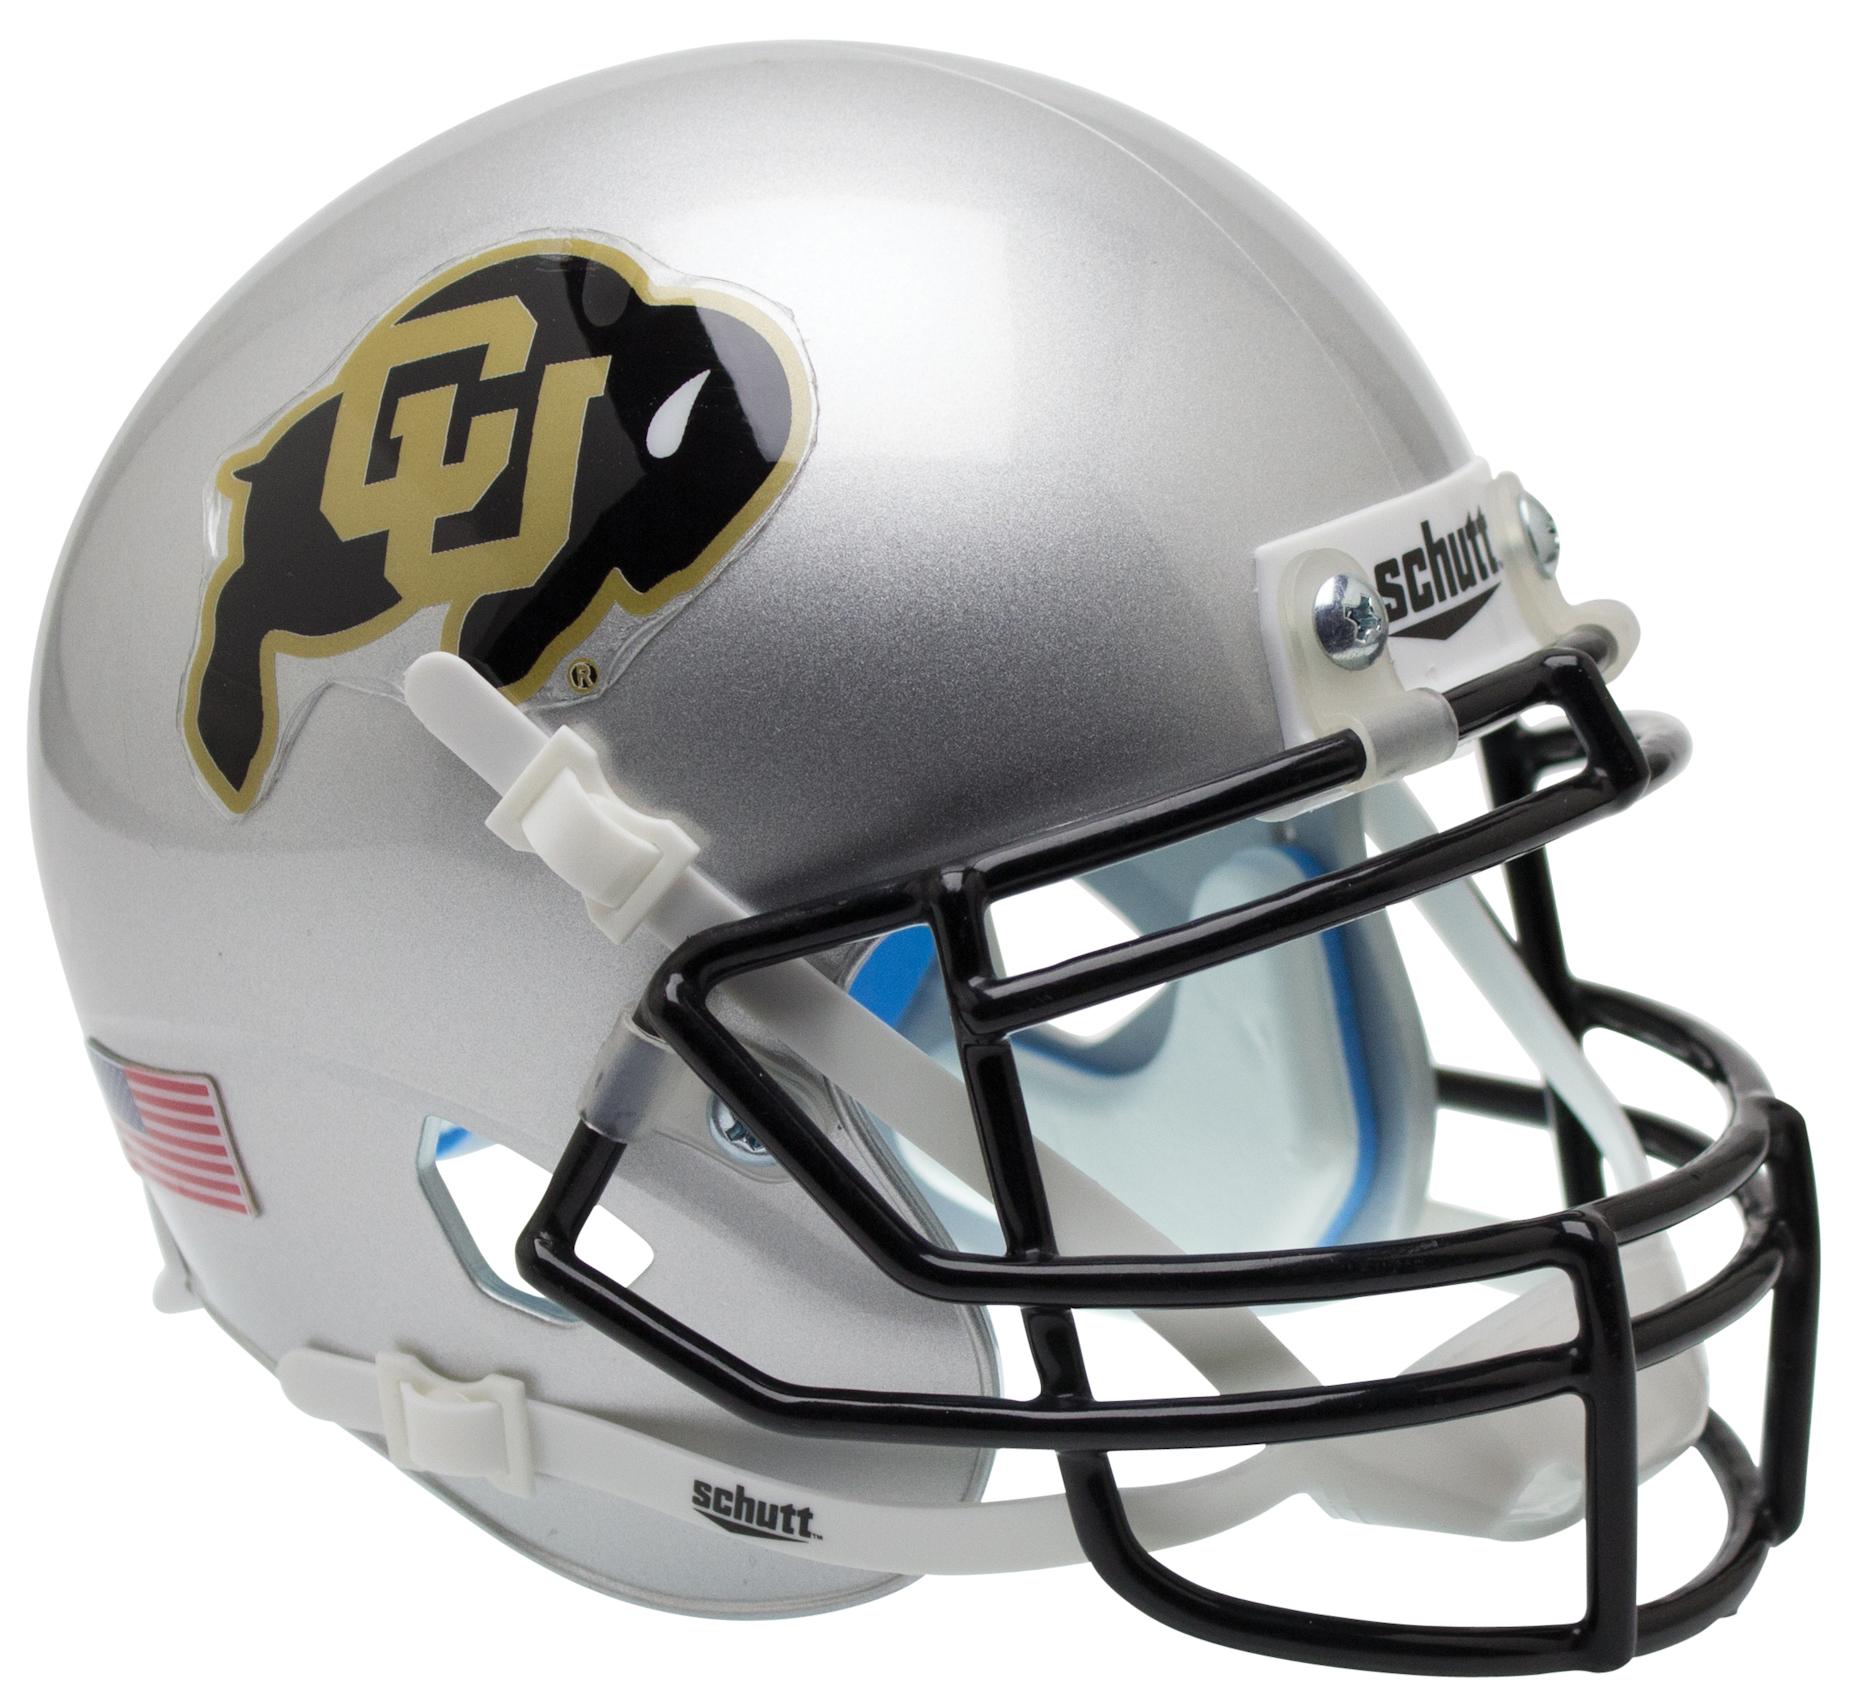 Colorado Buffaloes Authentic College XP Football Helmet Schutt <B>Silver</B>